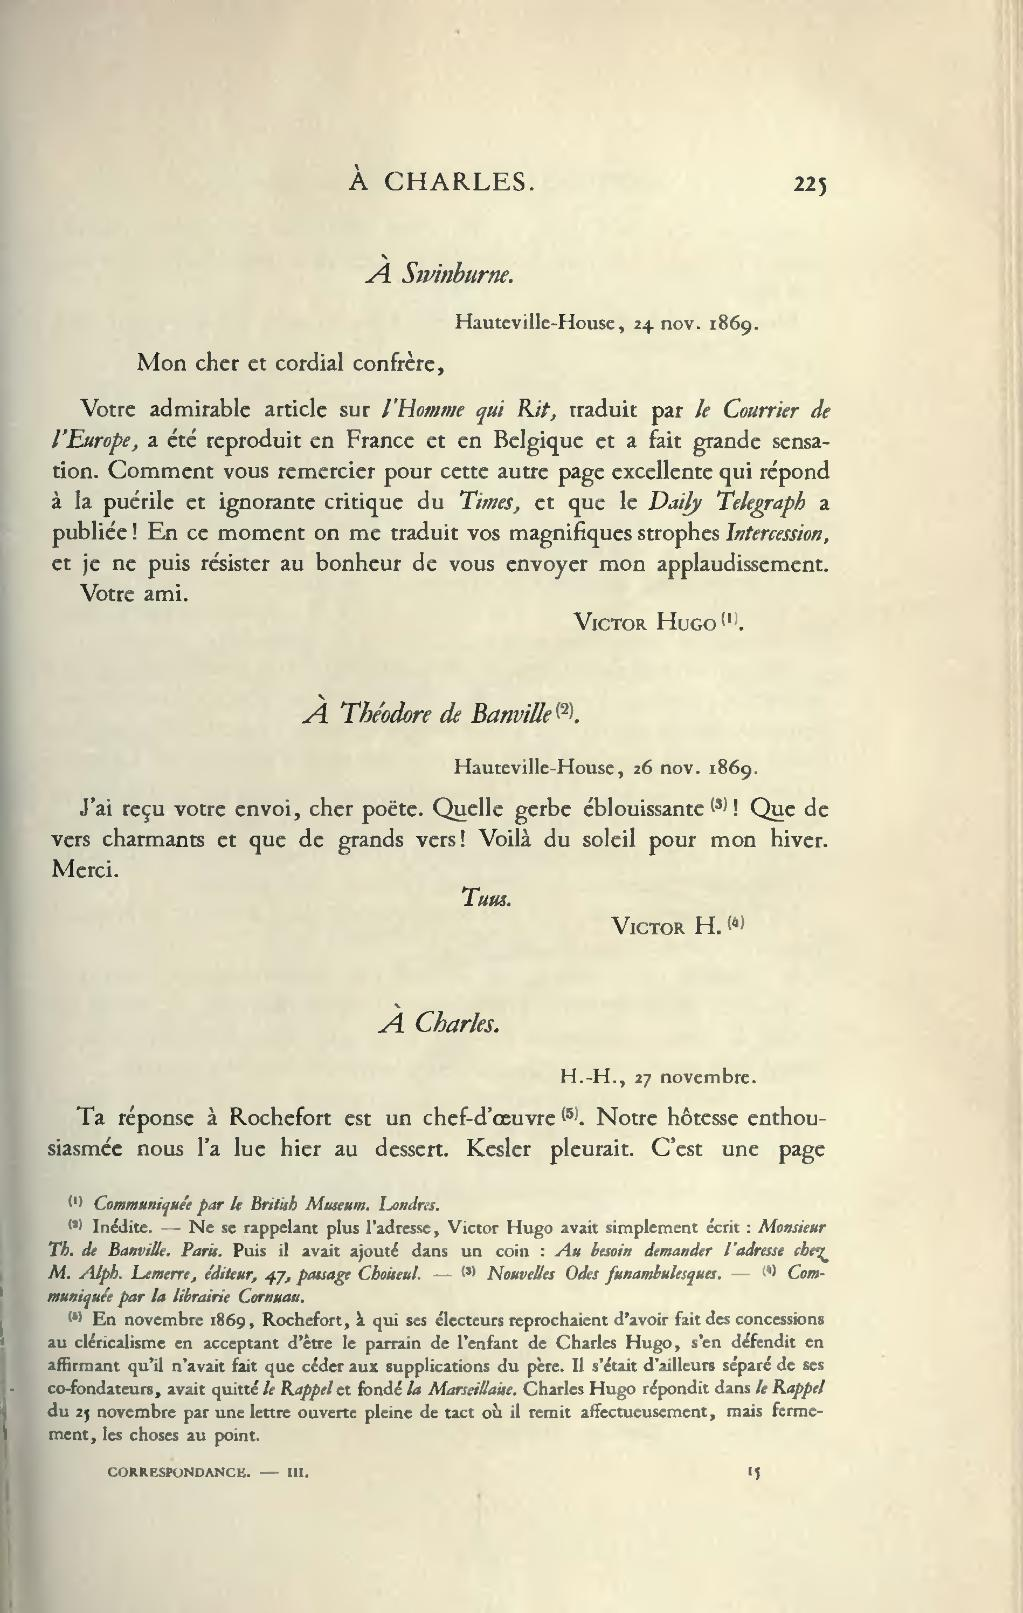 Page Hugo œuvres Completes Impr Nat Correspondance Tome Iii